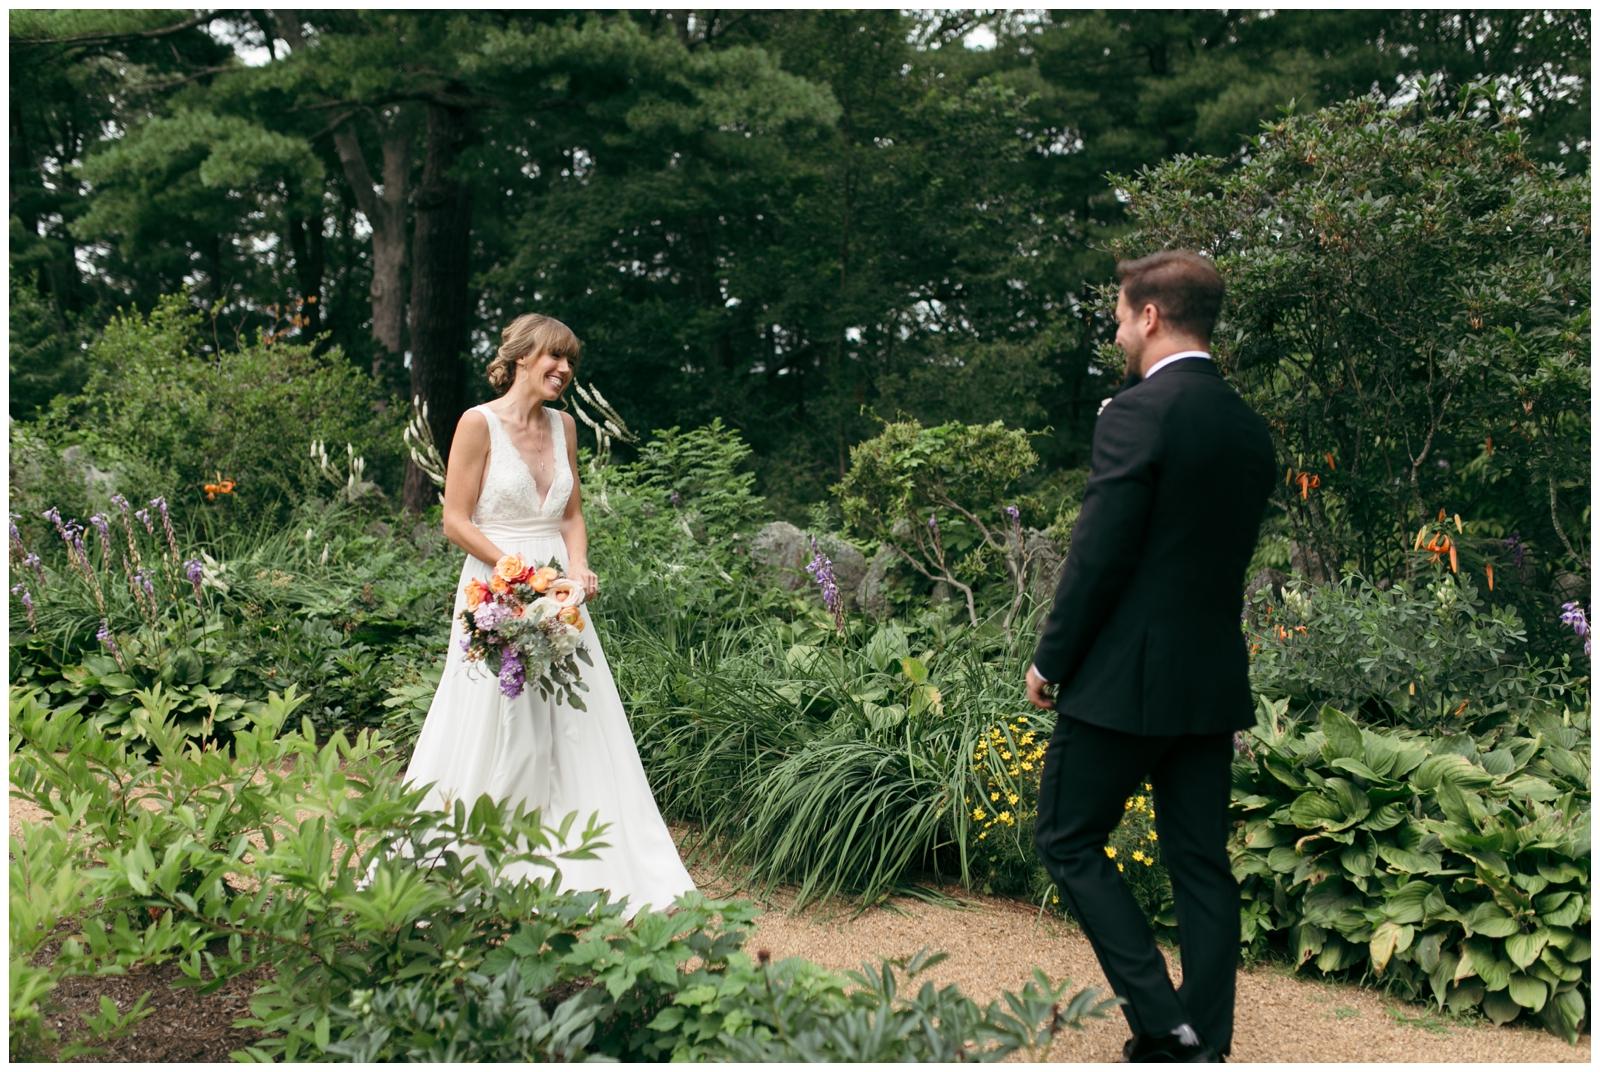 Moraine-Farm-wedding-Bailey-Q-Photo-Massachusetts-wedding-photpgrapher-016.jpg